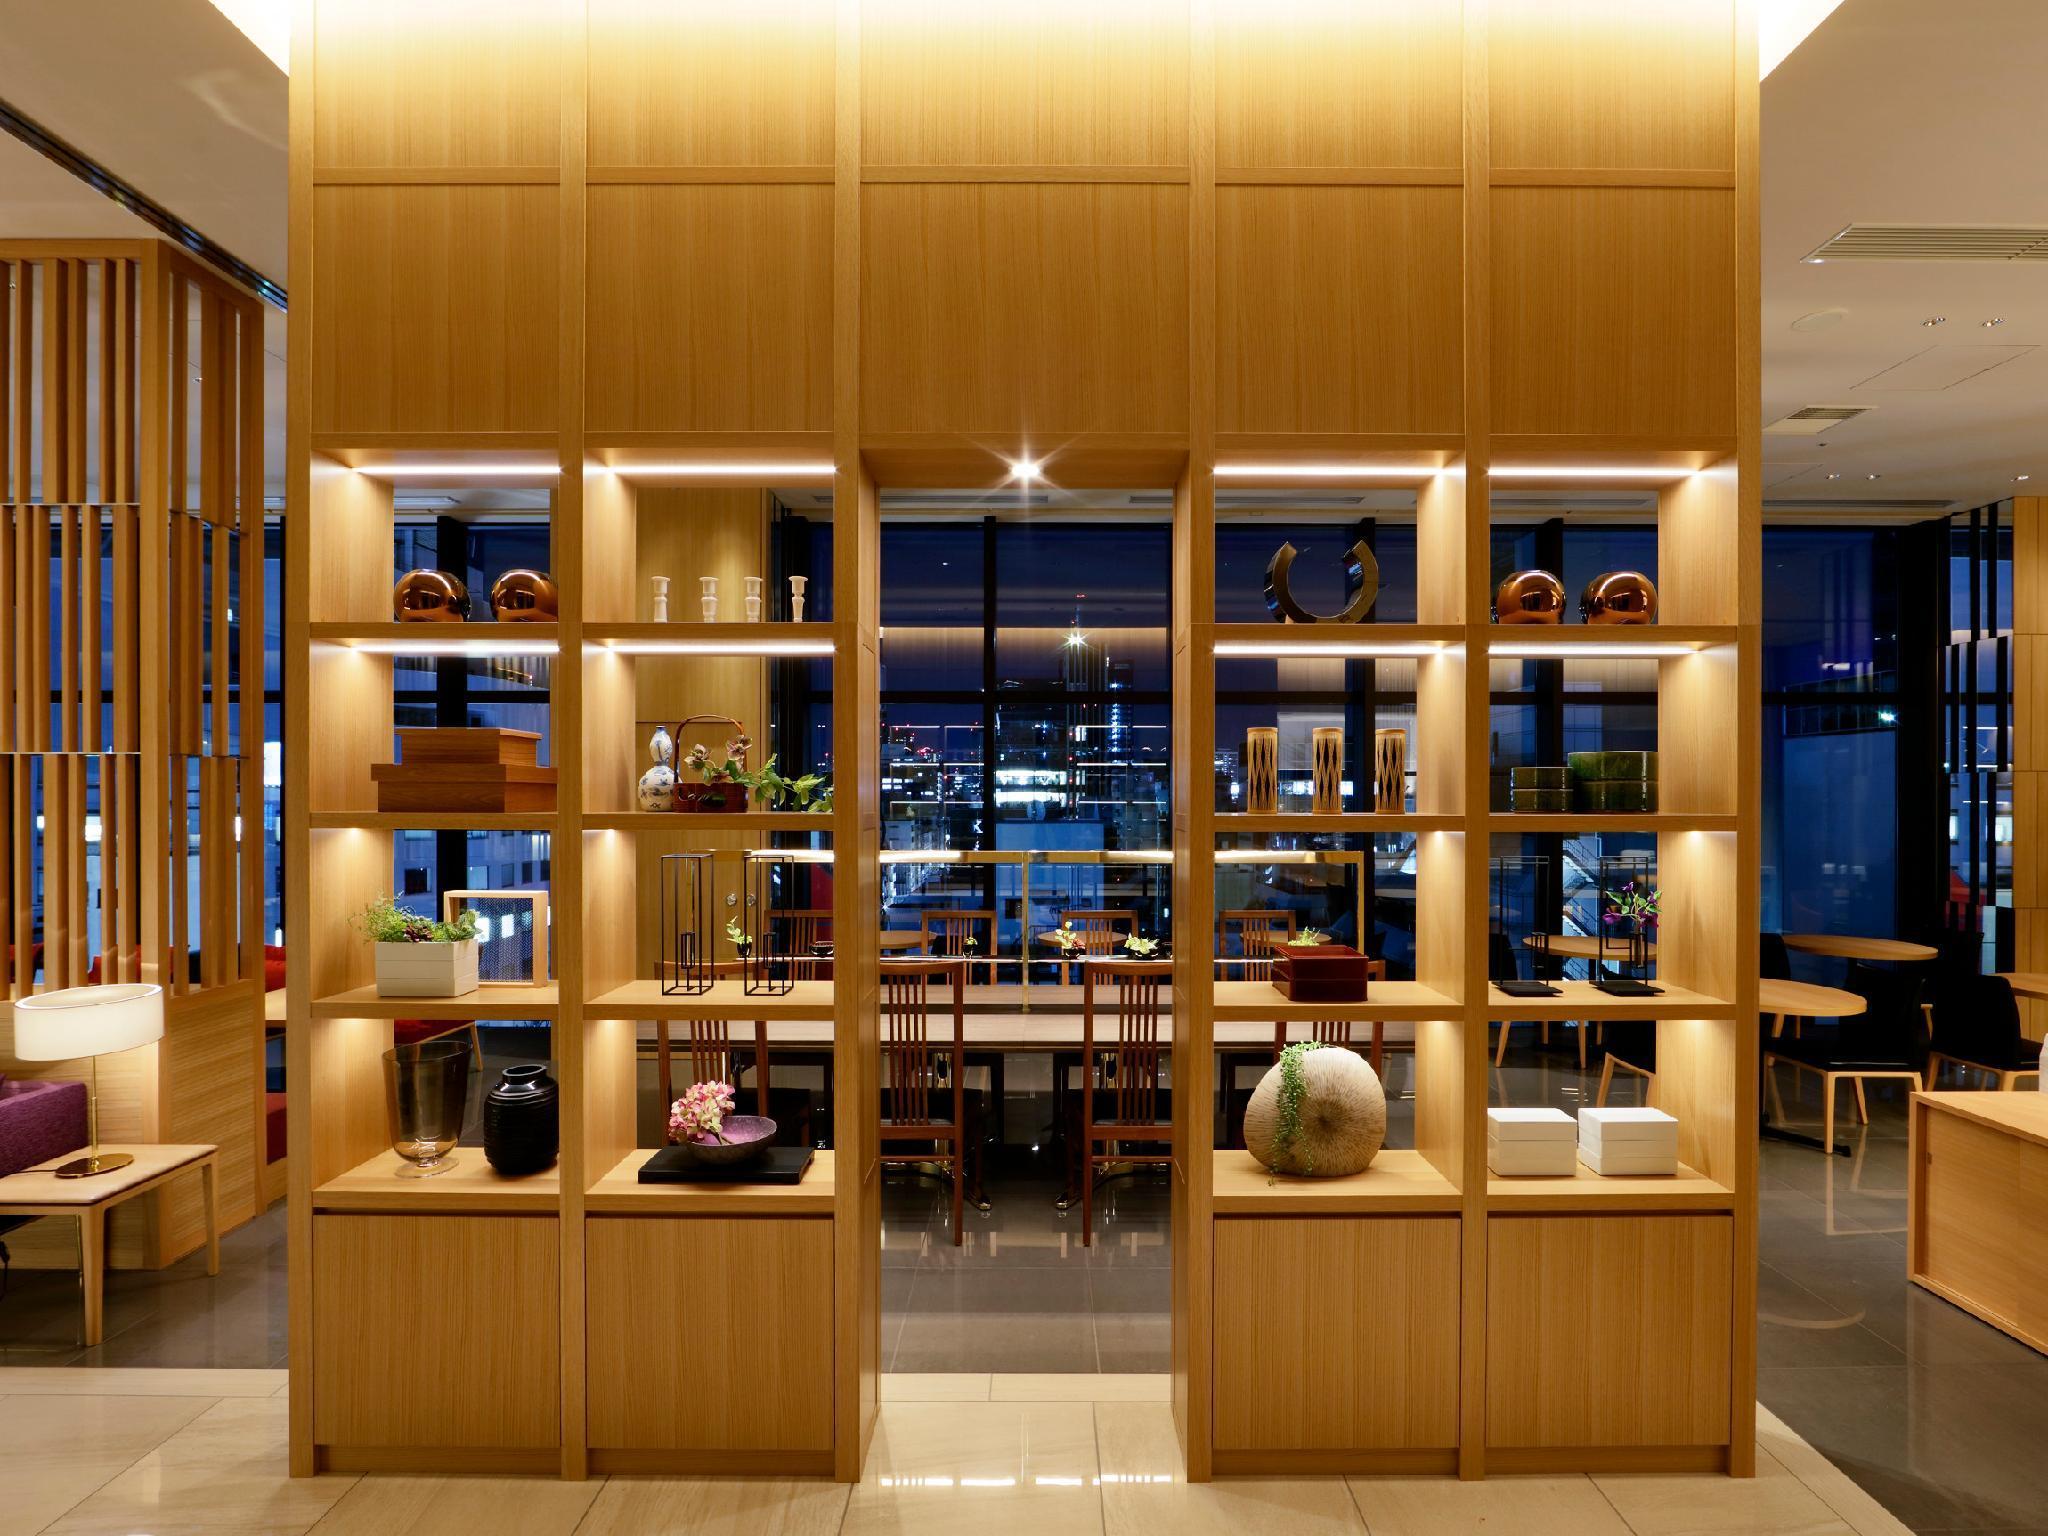 Candeo Hotels Tokyo Shimbashi Tokyo Japan Hotelltilbud i